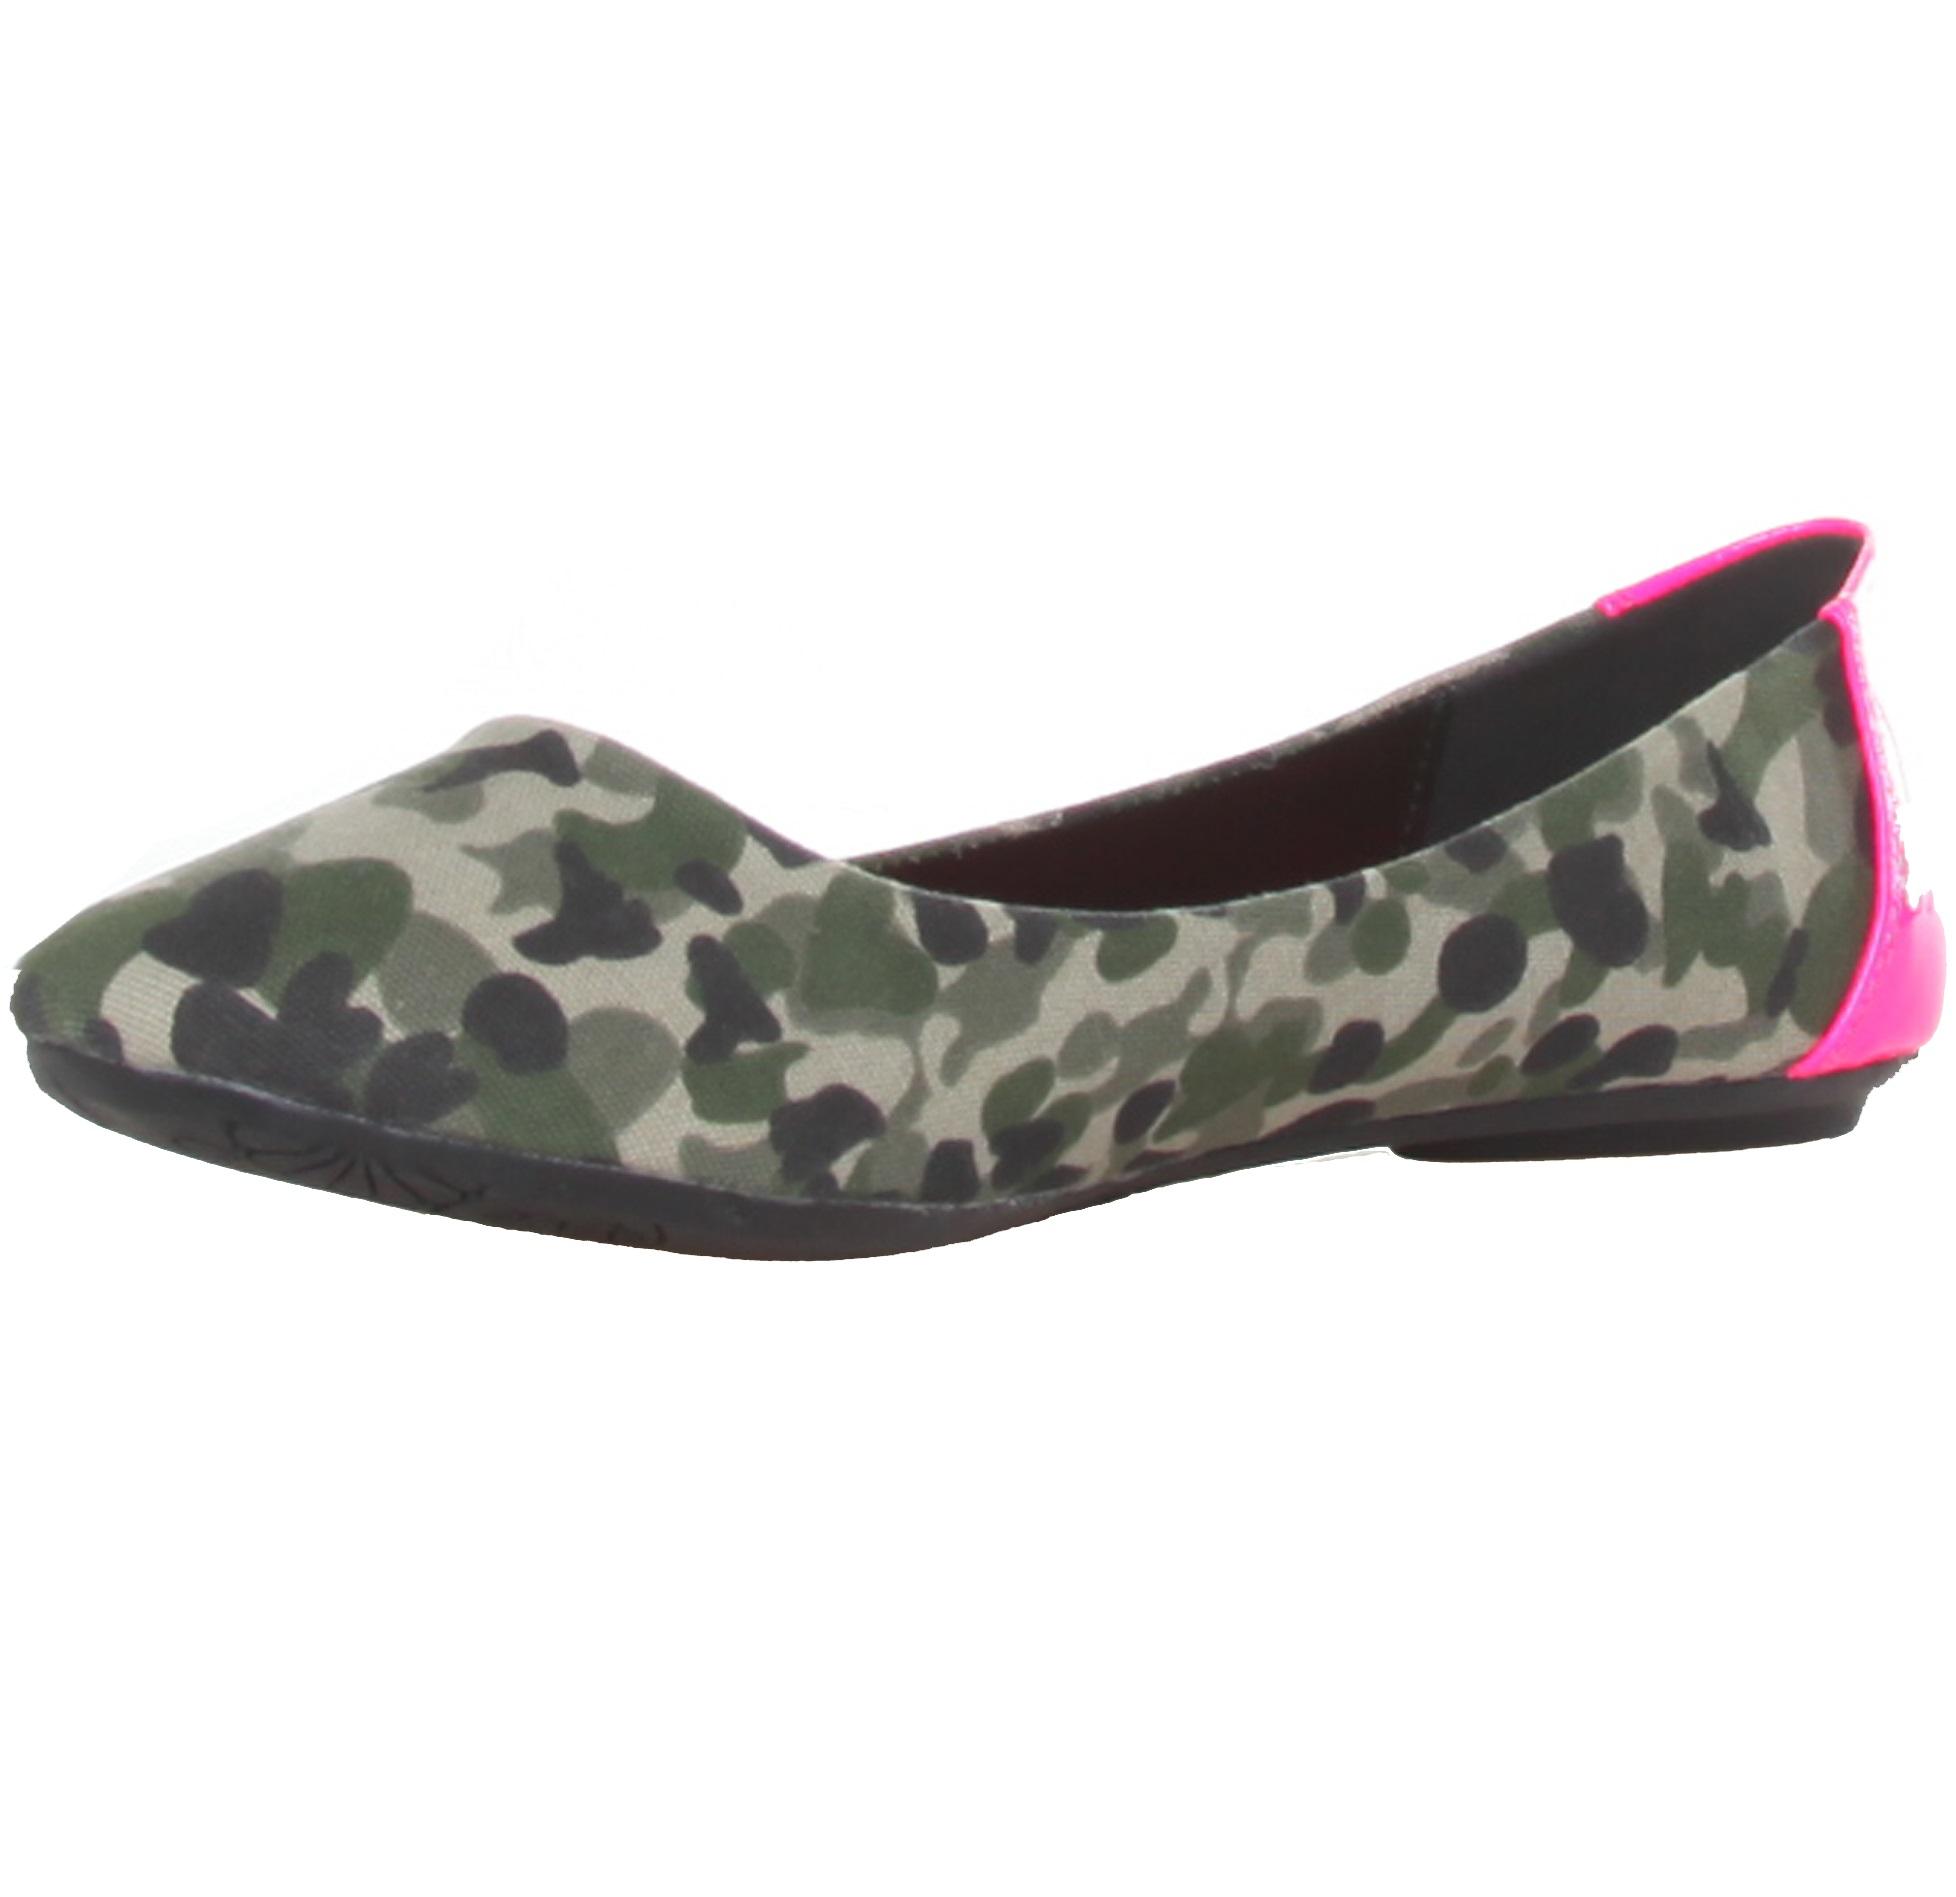 Ana Lublin Flat Shoes Militar Fuxia Rf600186